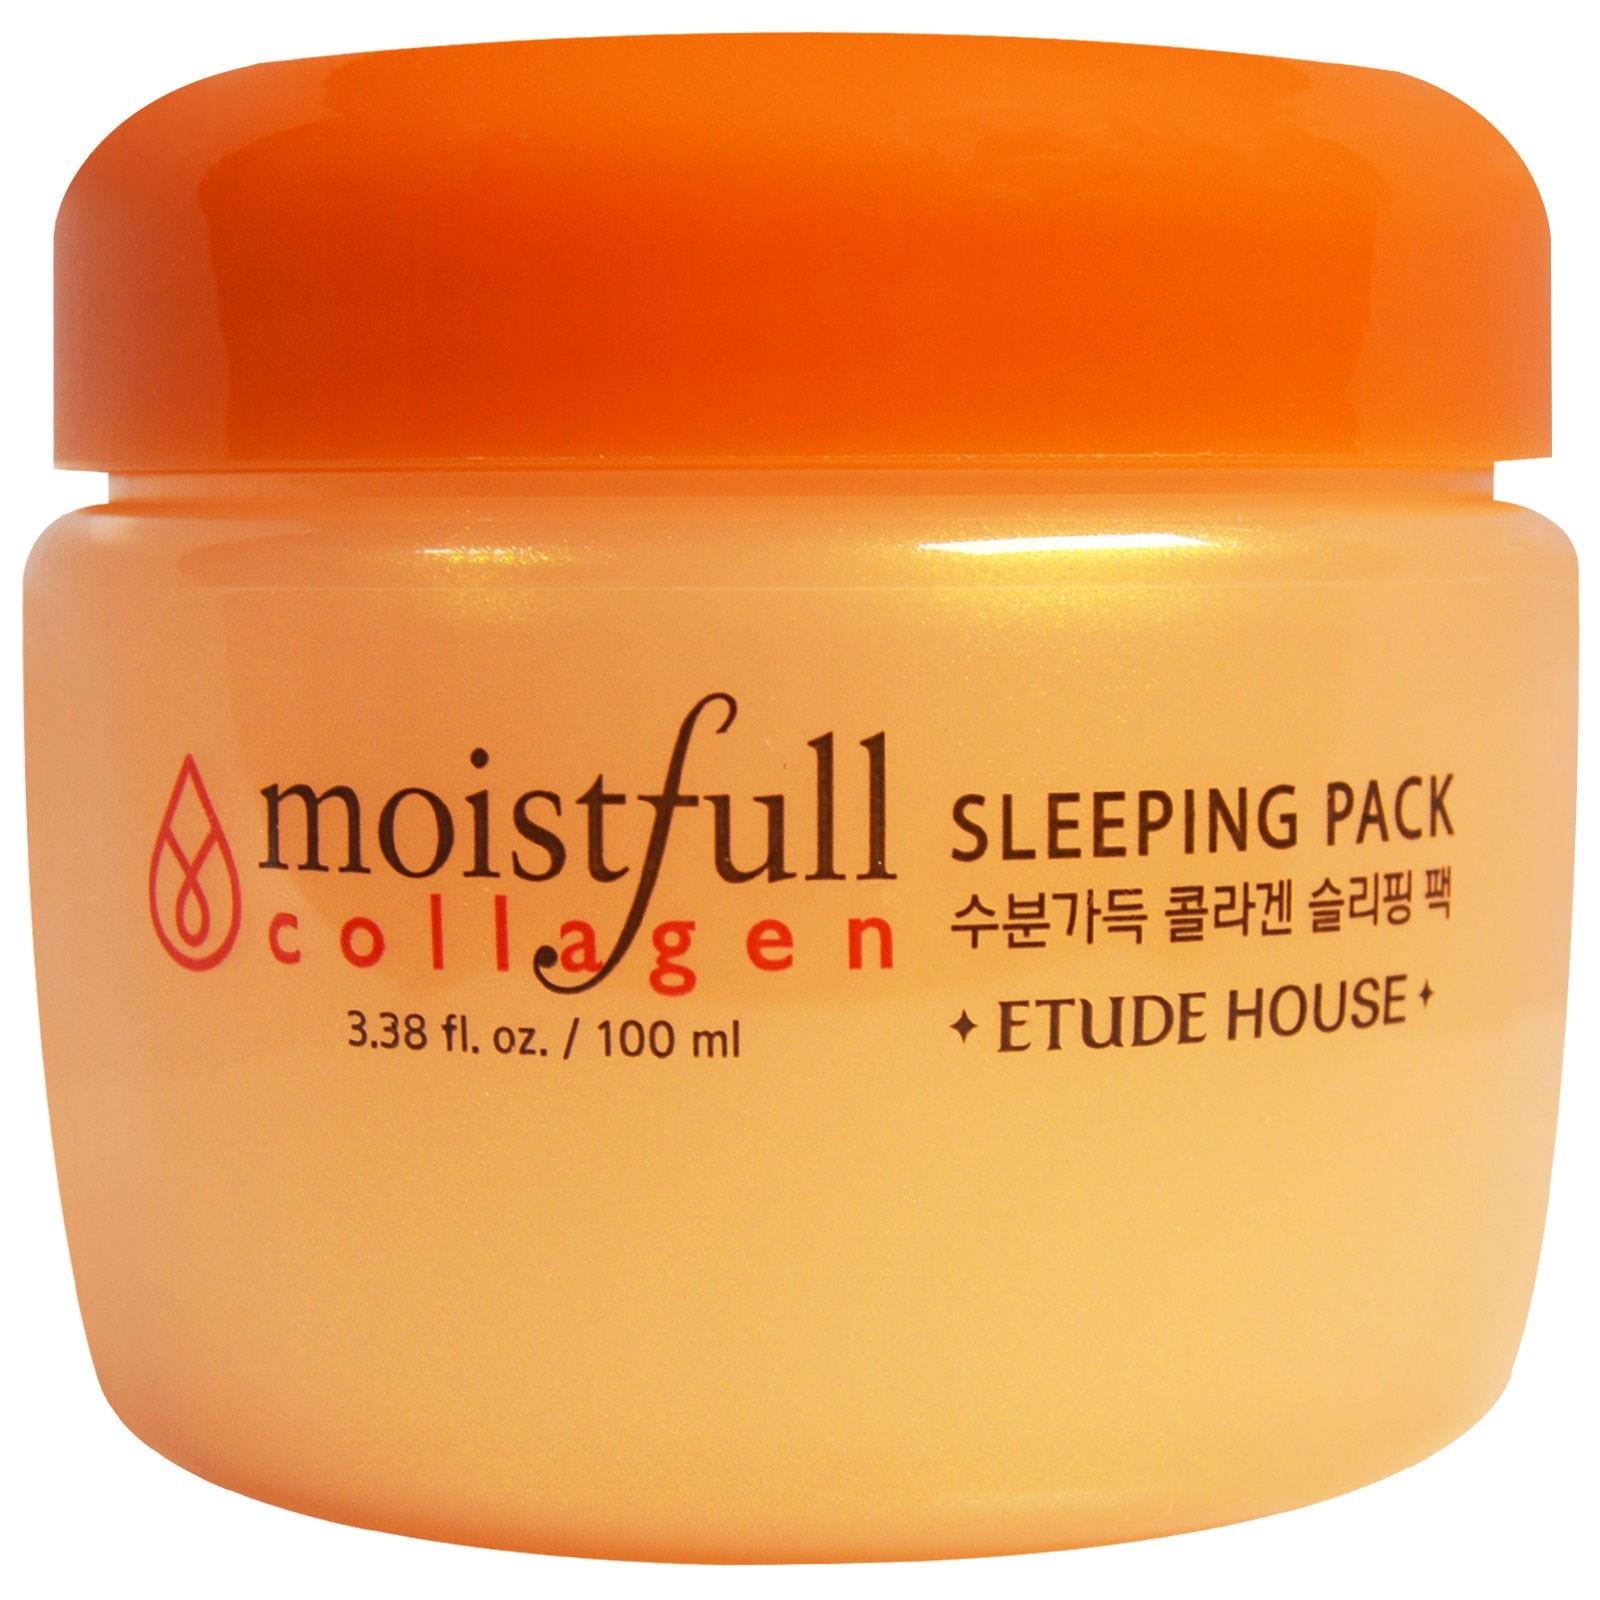 ETUDE HOUSE Увлажняющая ночная маска Moistfull Collagen Sleeping Pack маска для лица с коллагеном etude house collagen moistfull collagen